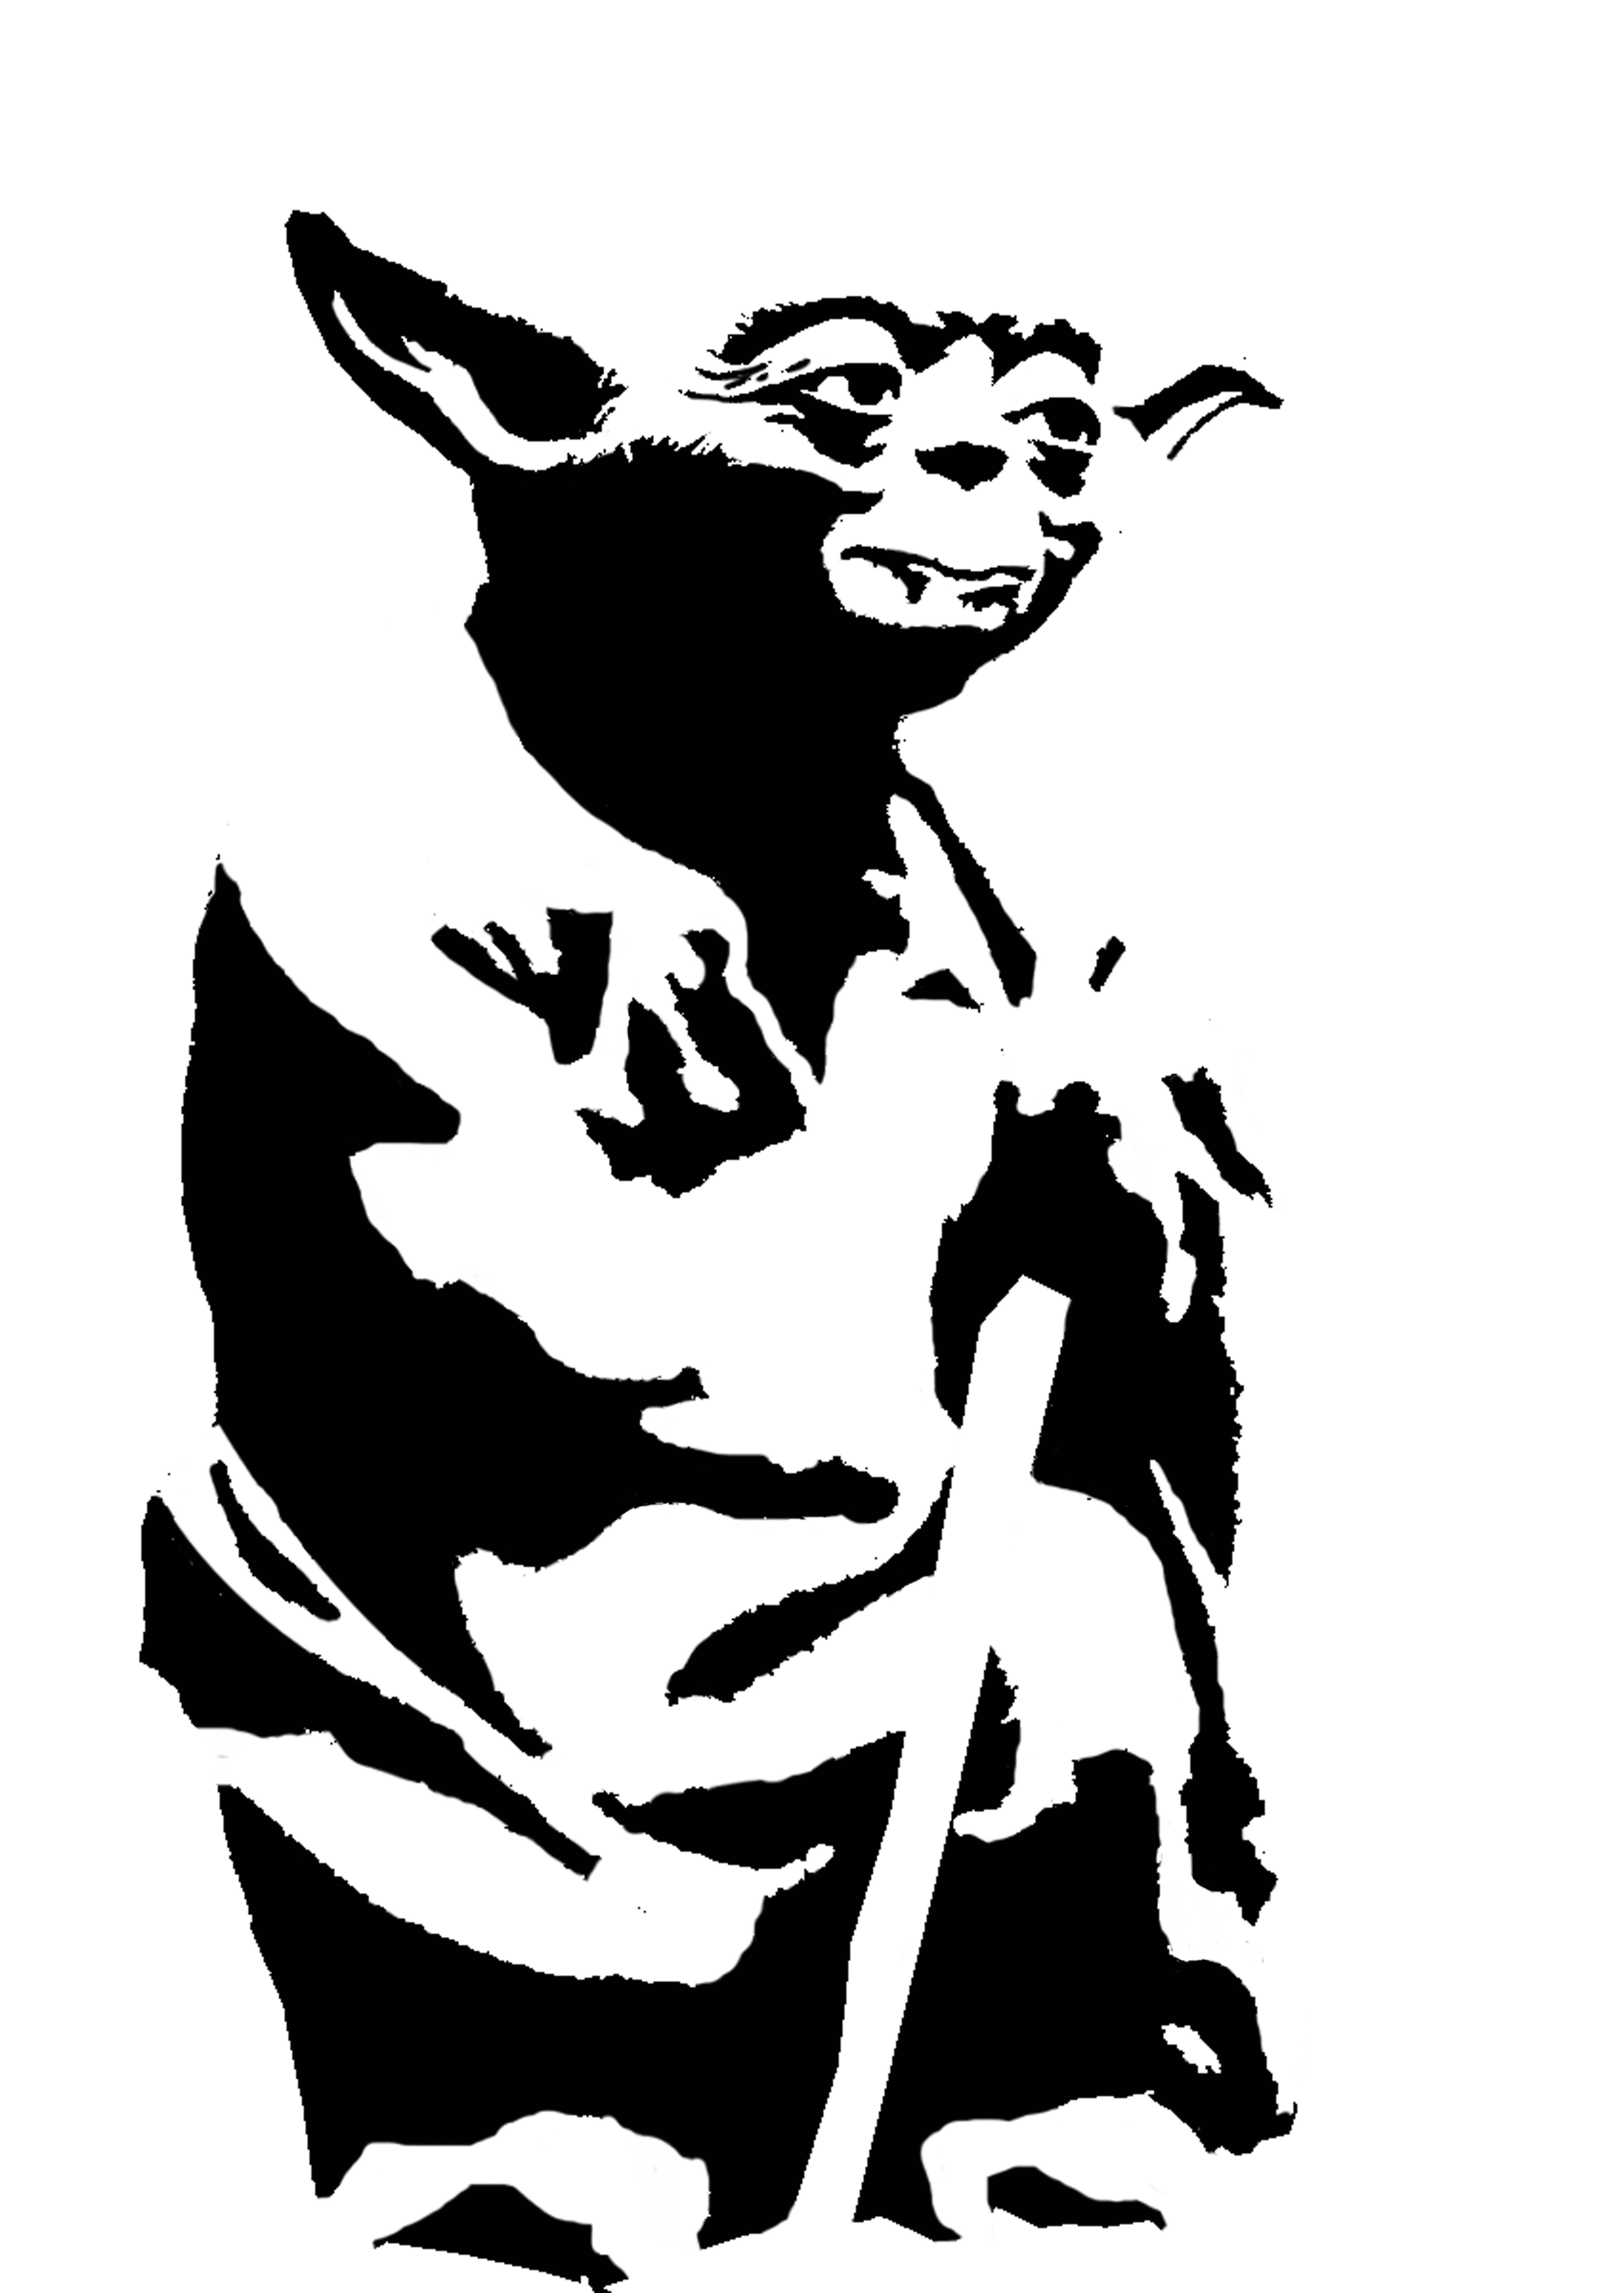 Line Art Yoda : Yoda stencil template templates pinterest